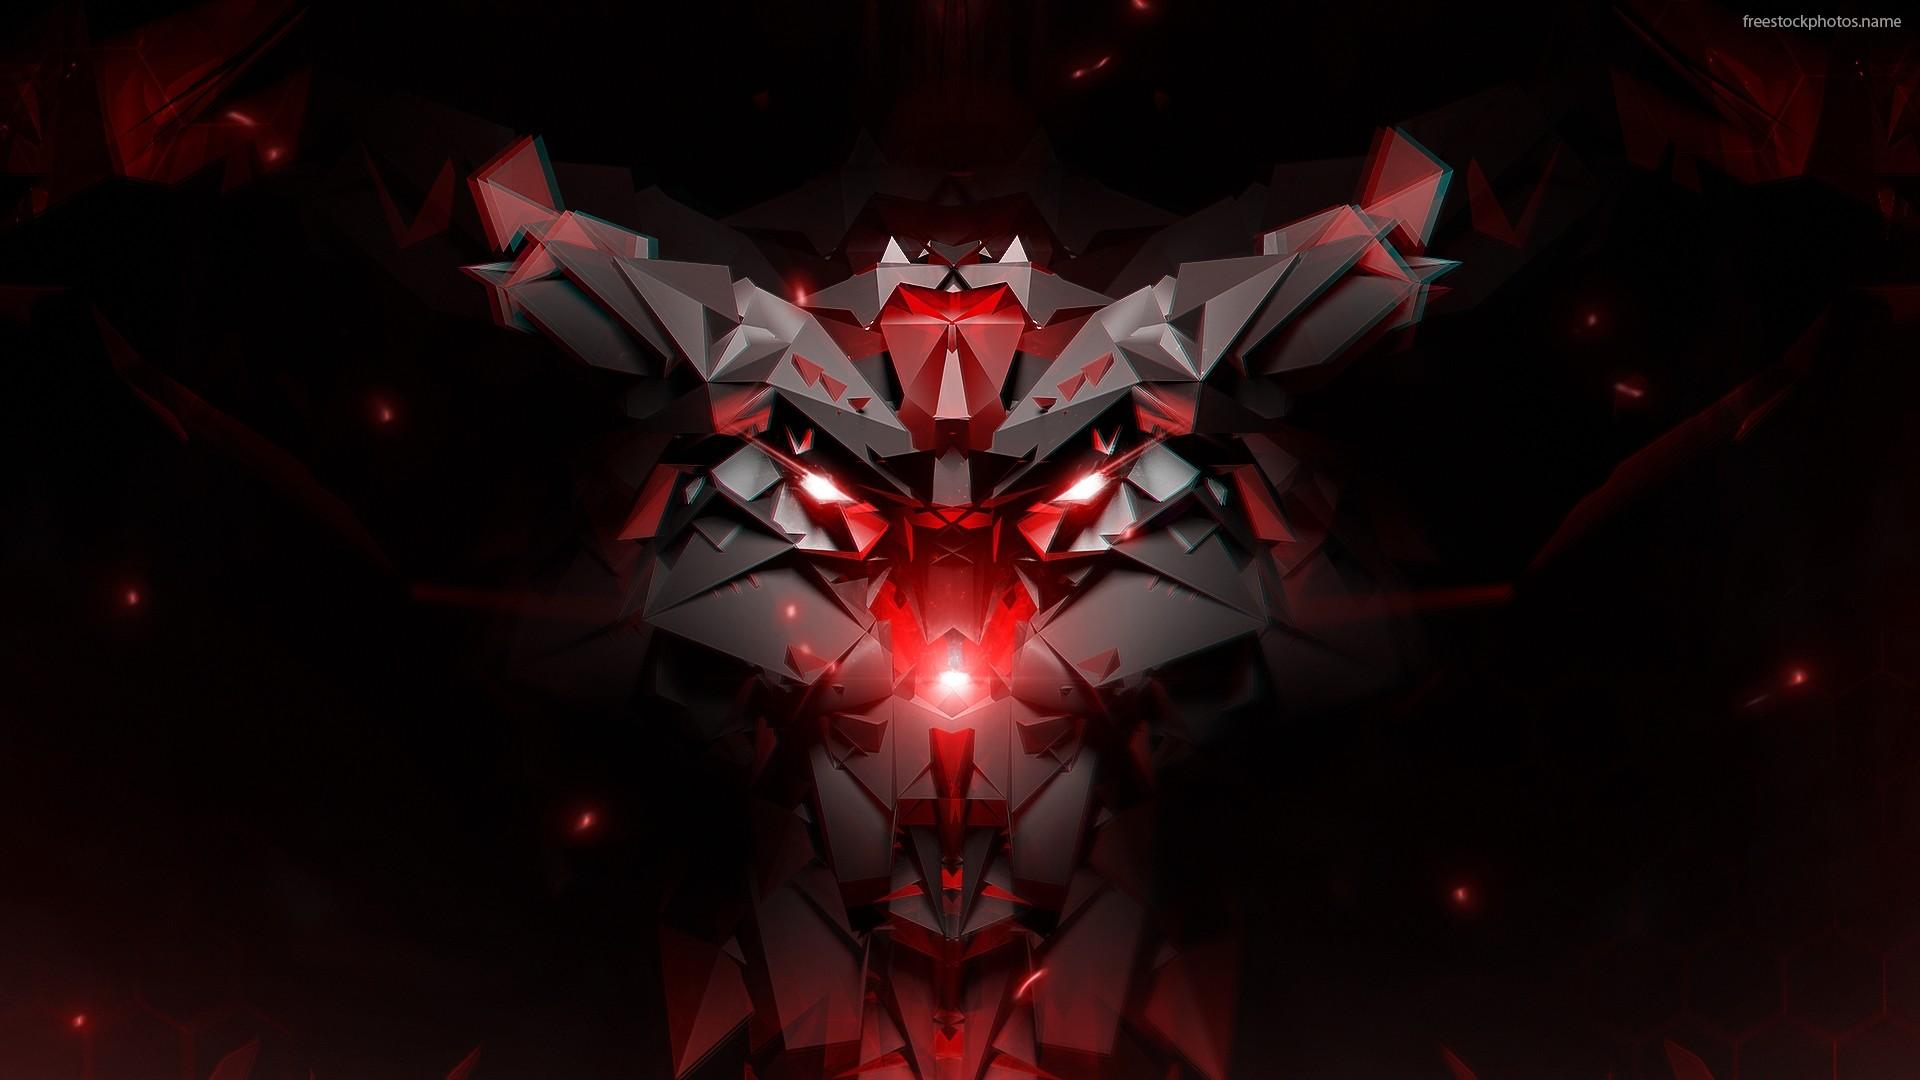 Dark Red Abstract Desktop HD Wallpaper